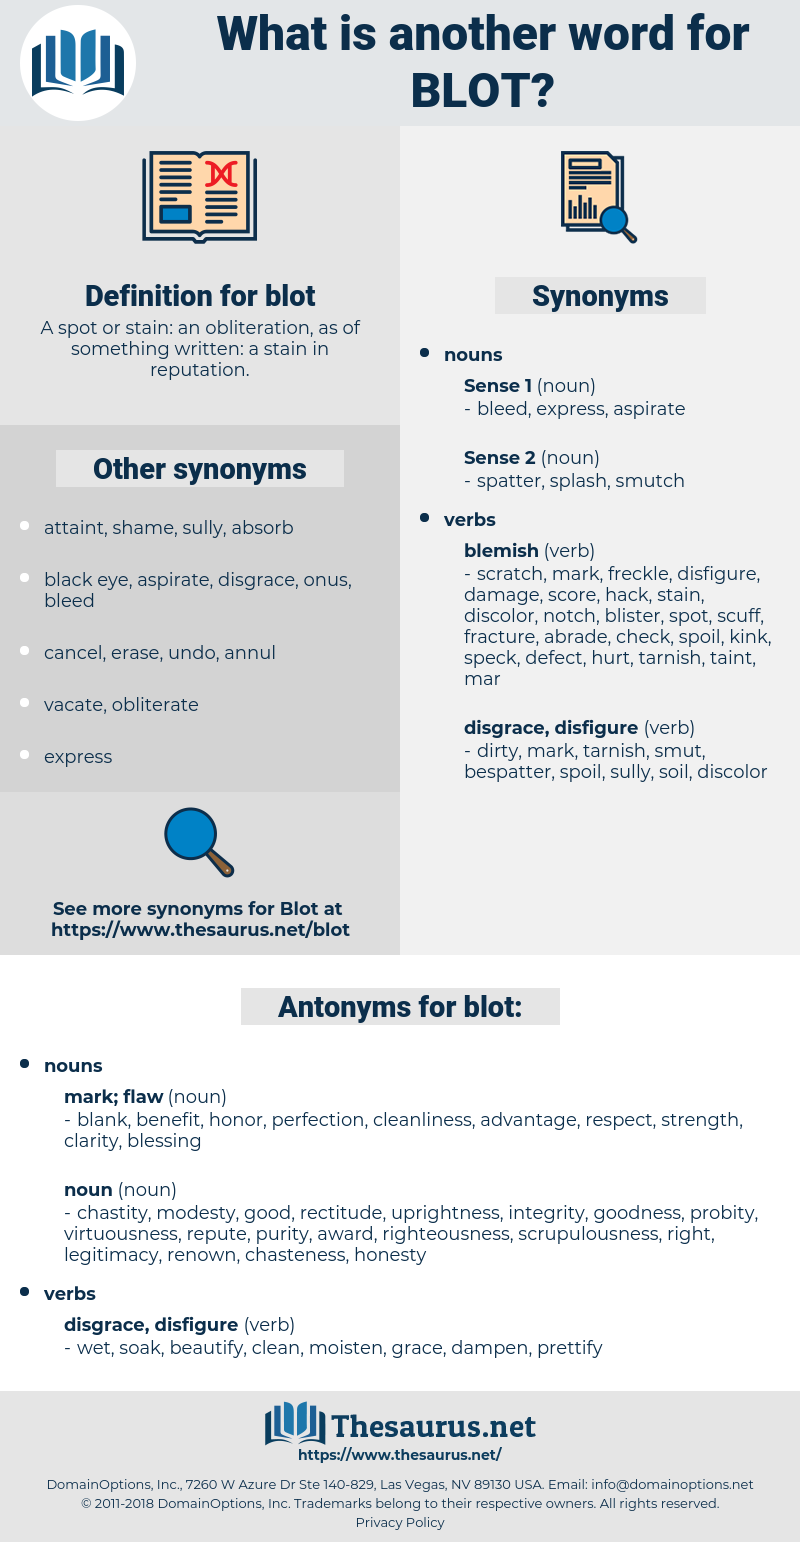 blot, synonym blot, another word for blot, words like blot, thesaurus blot